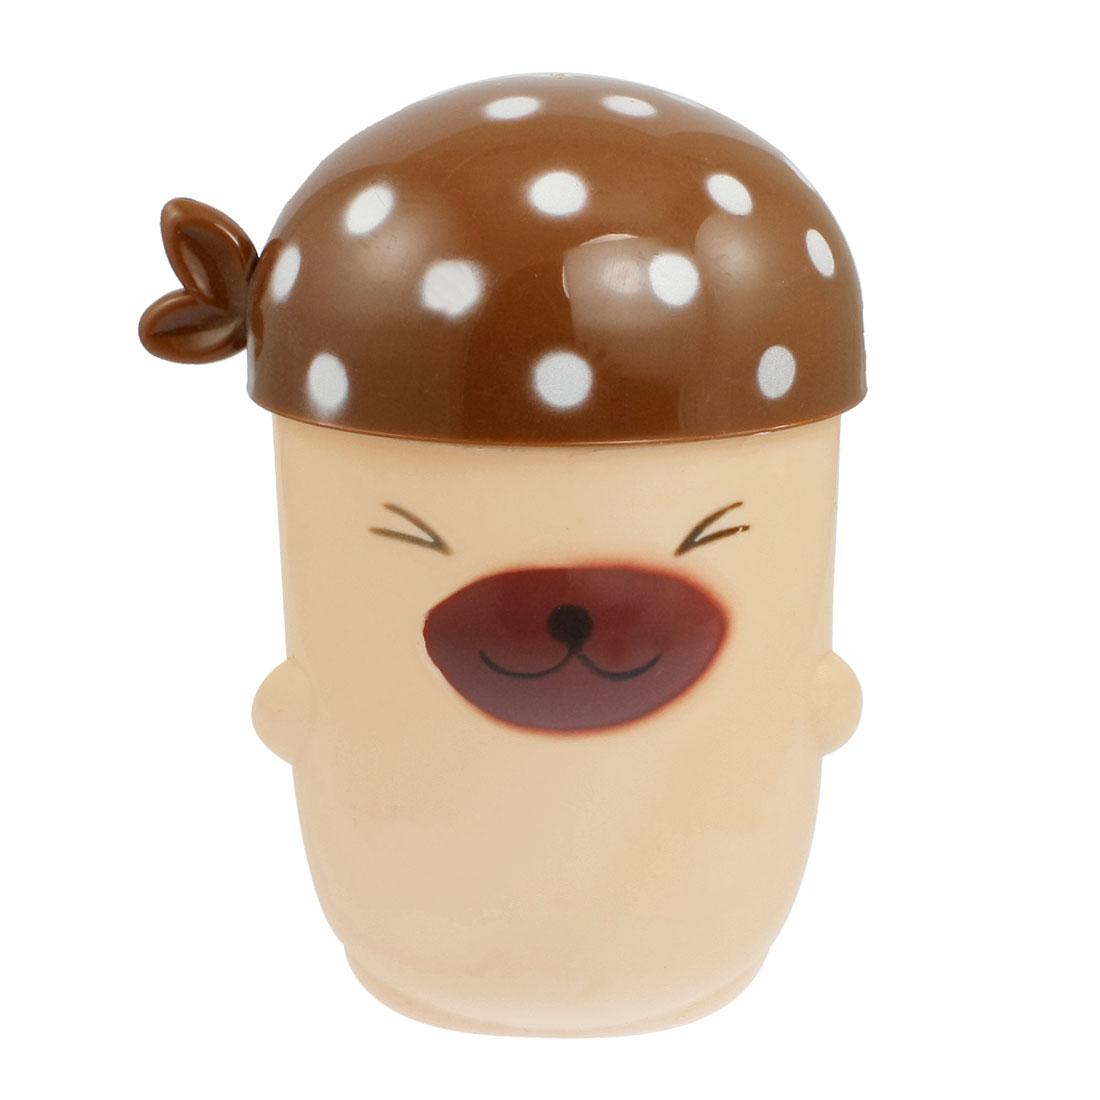 Drink Cartoon Dog Design Plastic Cup Ivory for Children